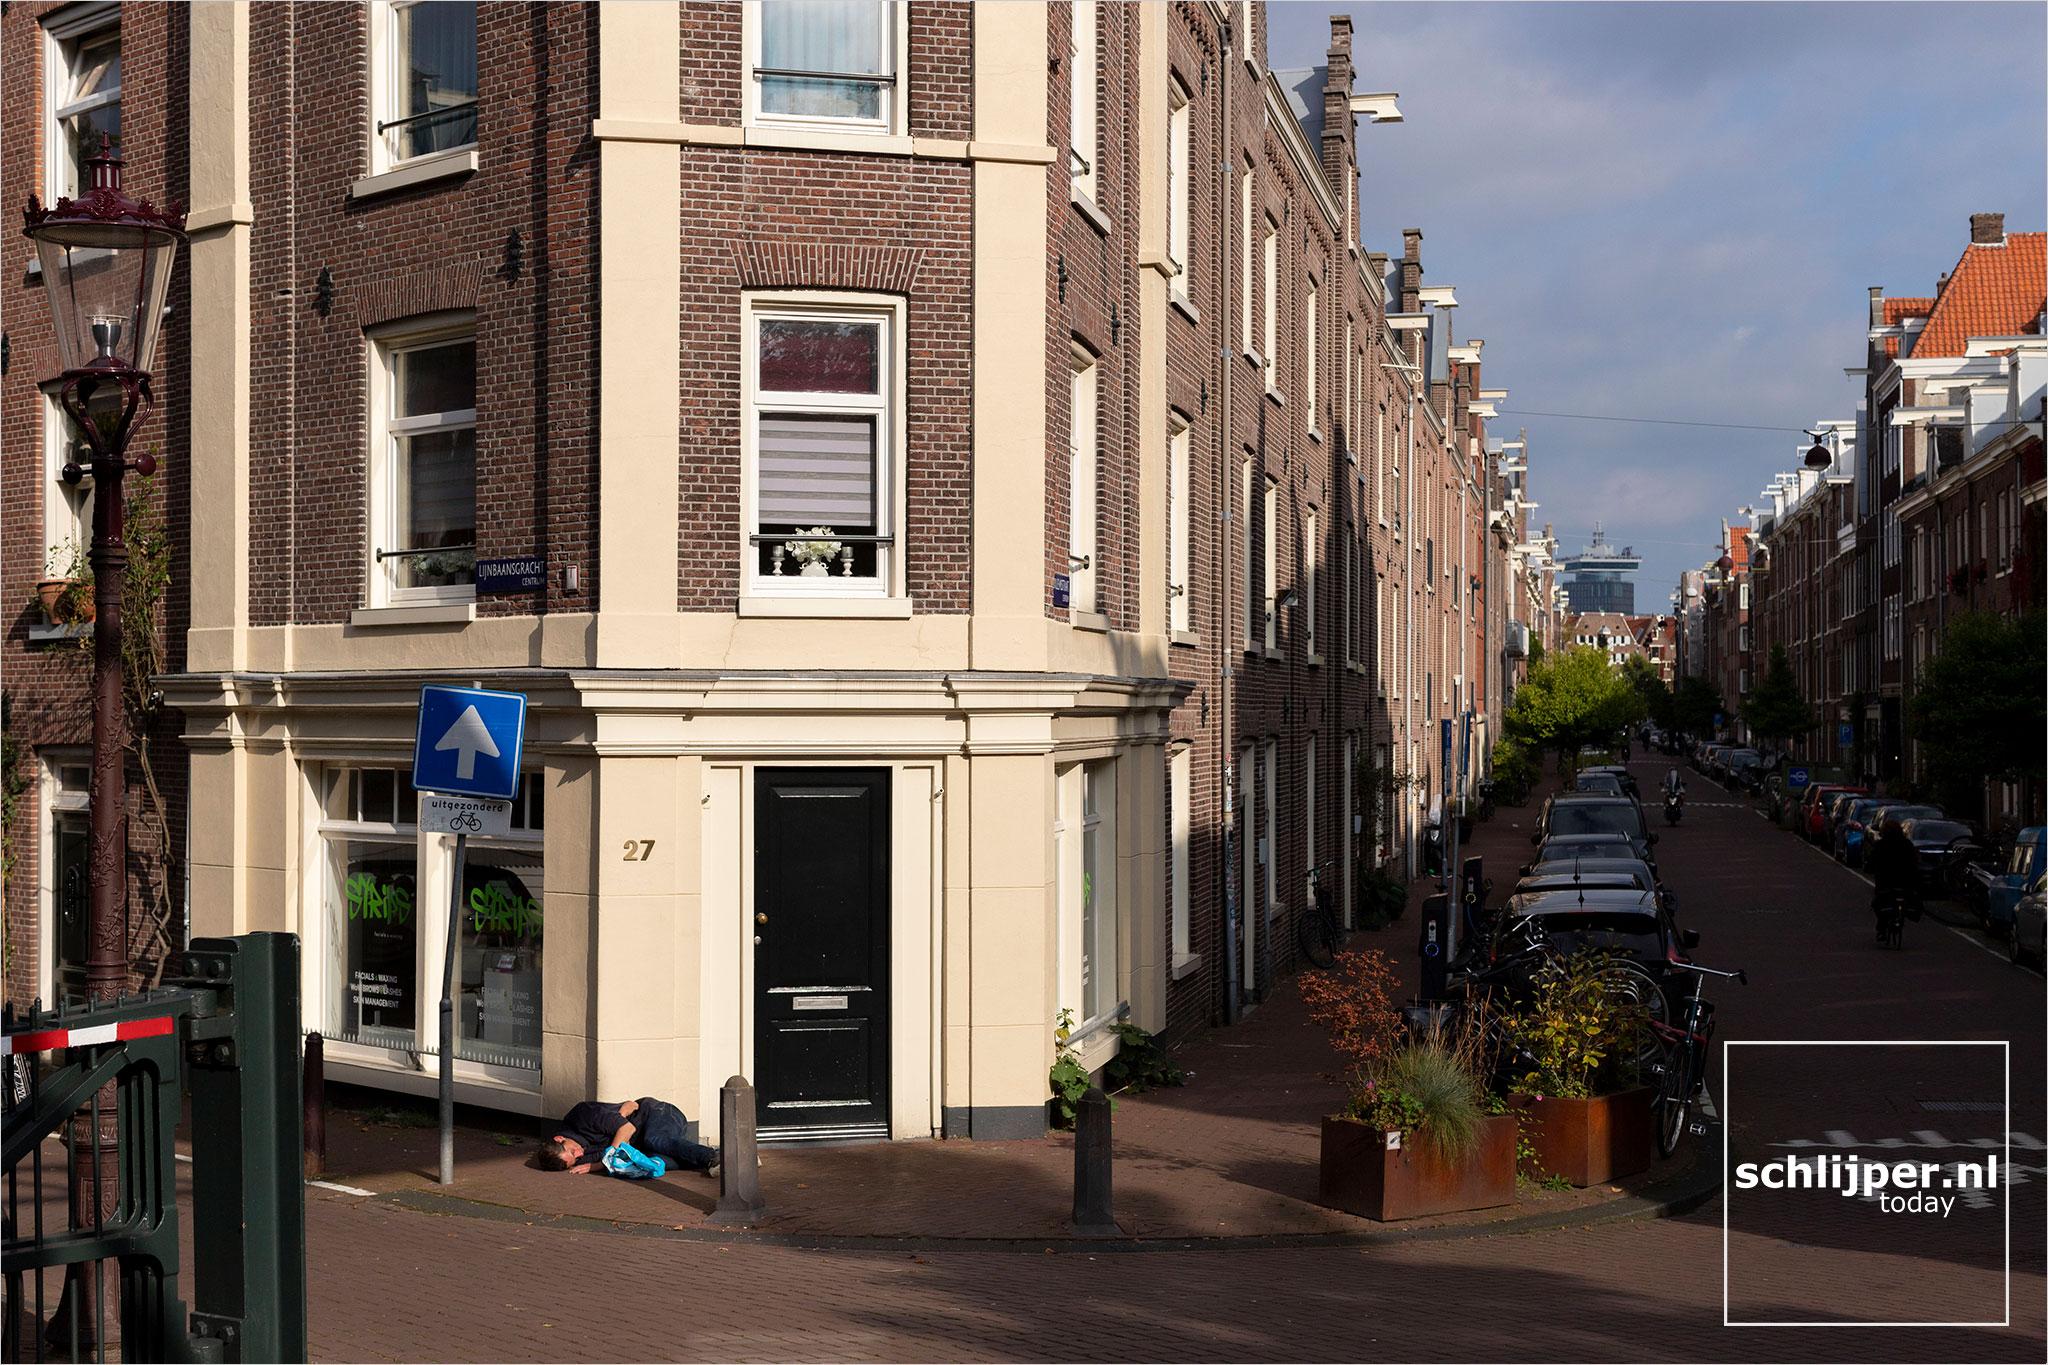 The Netherlands, Amsterdam, 10 oktober 2021